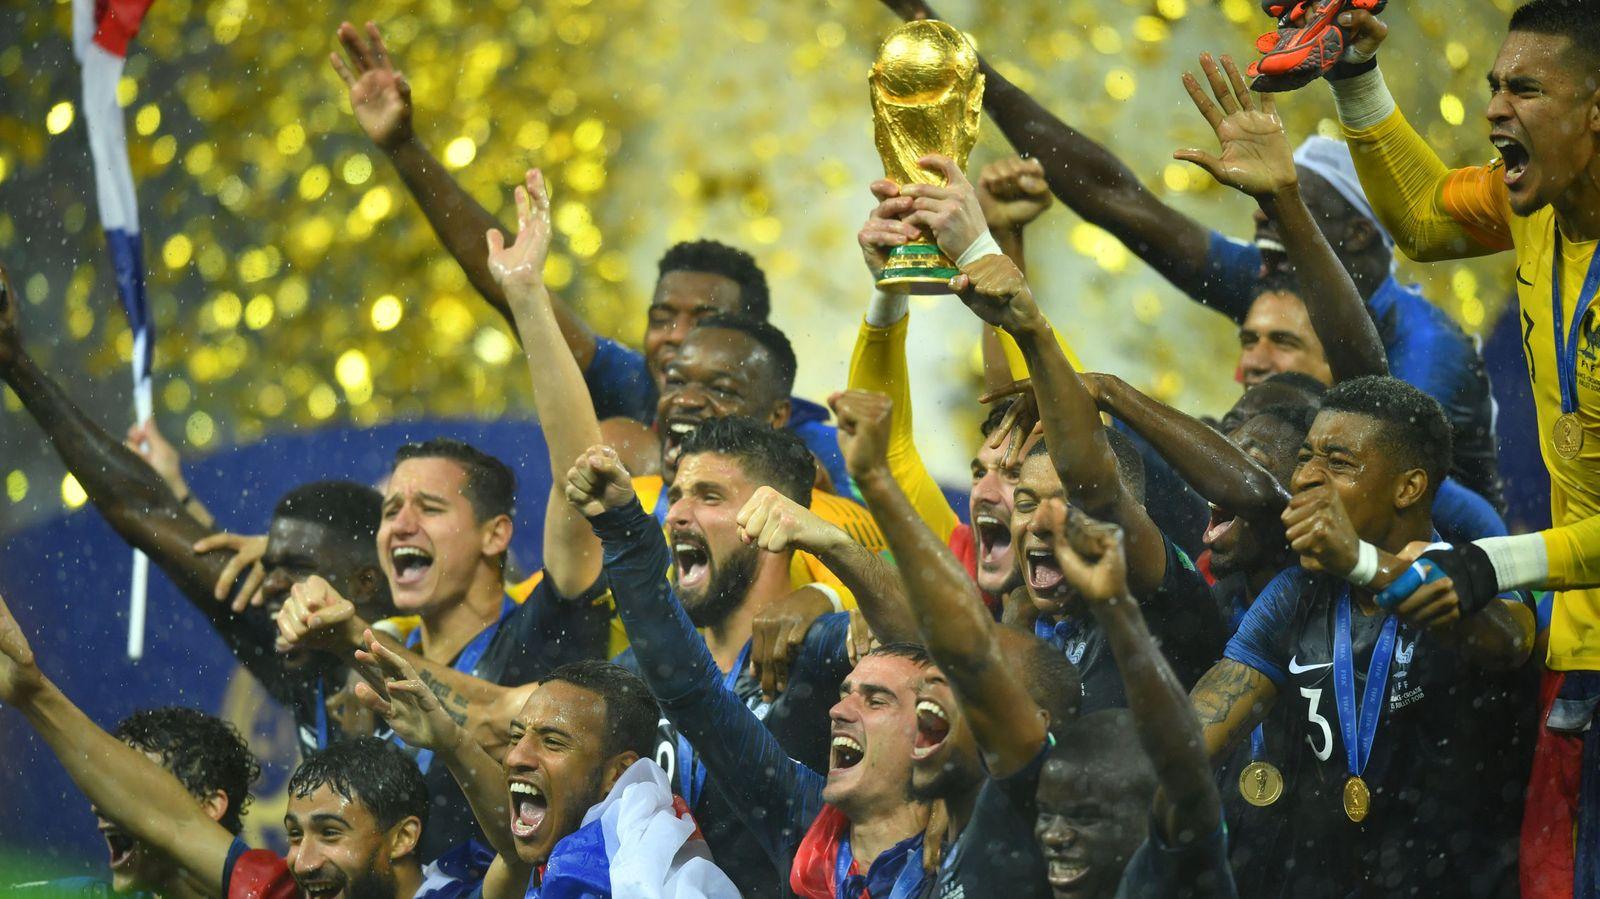 Foto: Francia volvió a ganar el Mundial 20 años después. (Reuters)